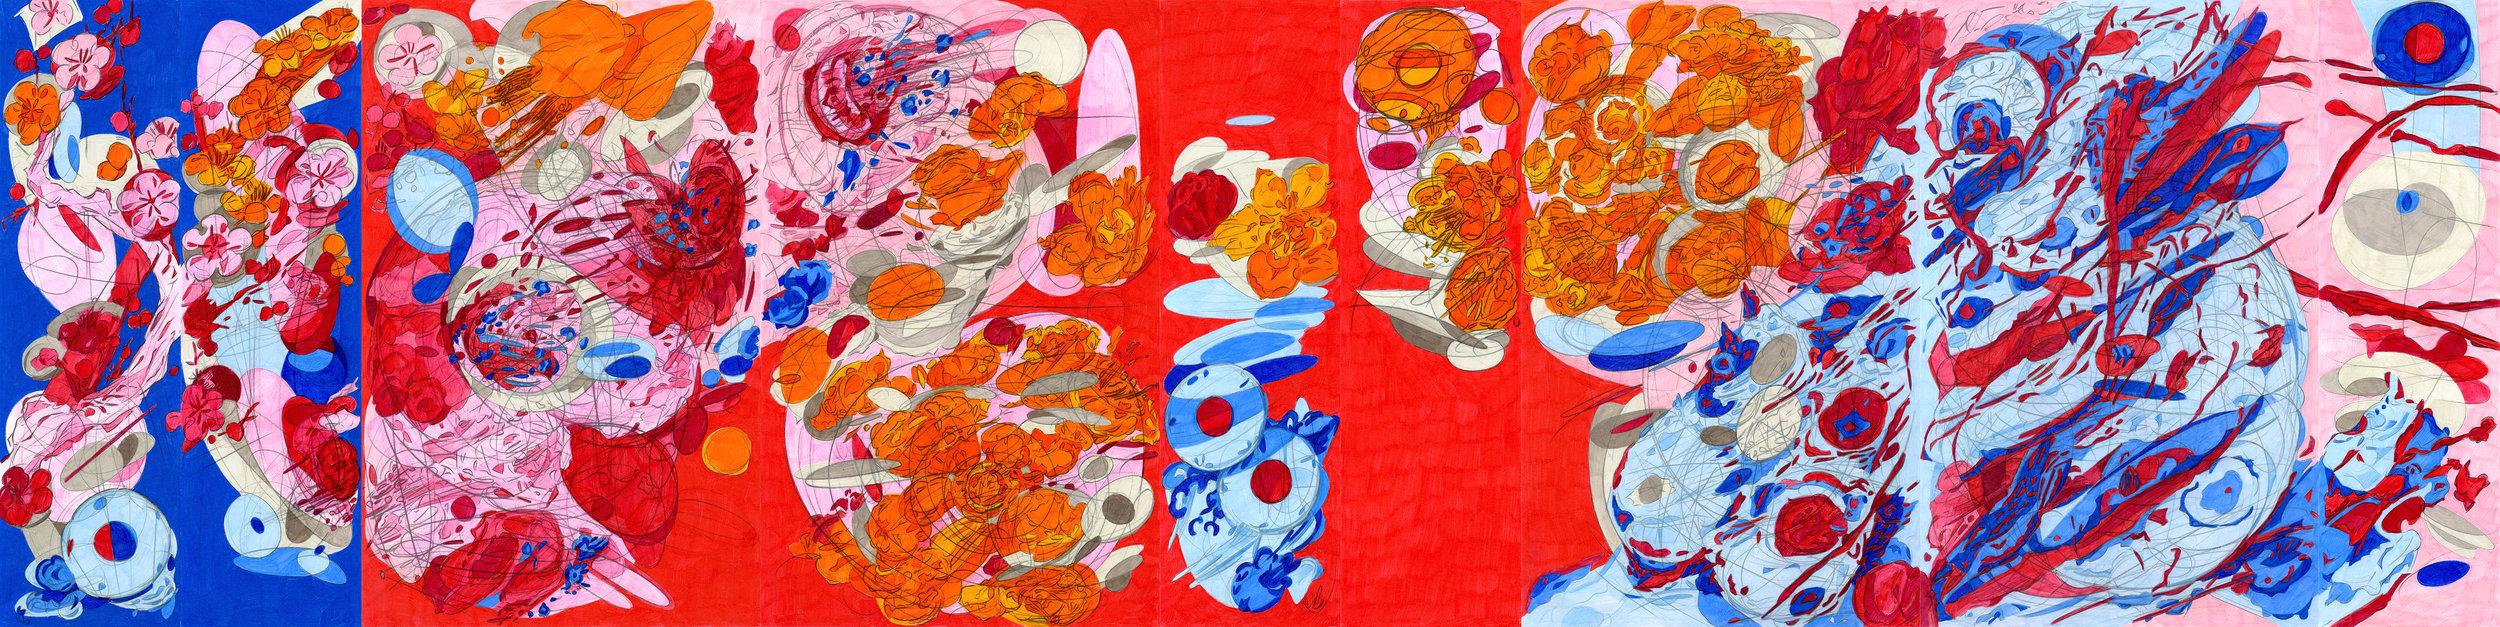 Double Self Split Colour 3, coloured pencil on paper, Melissa Marks.